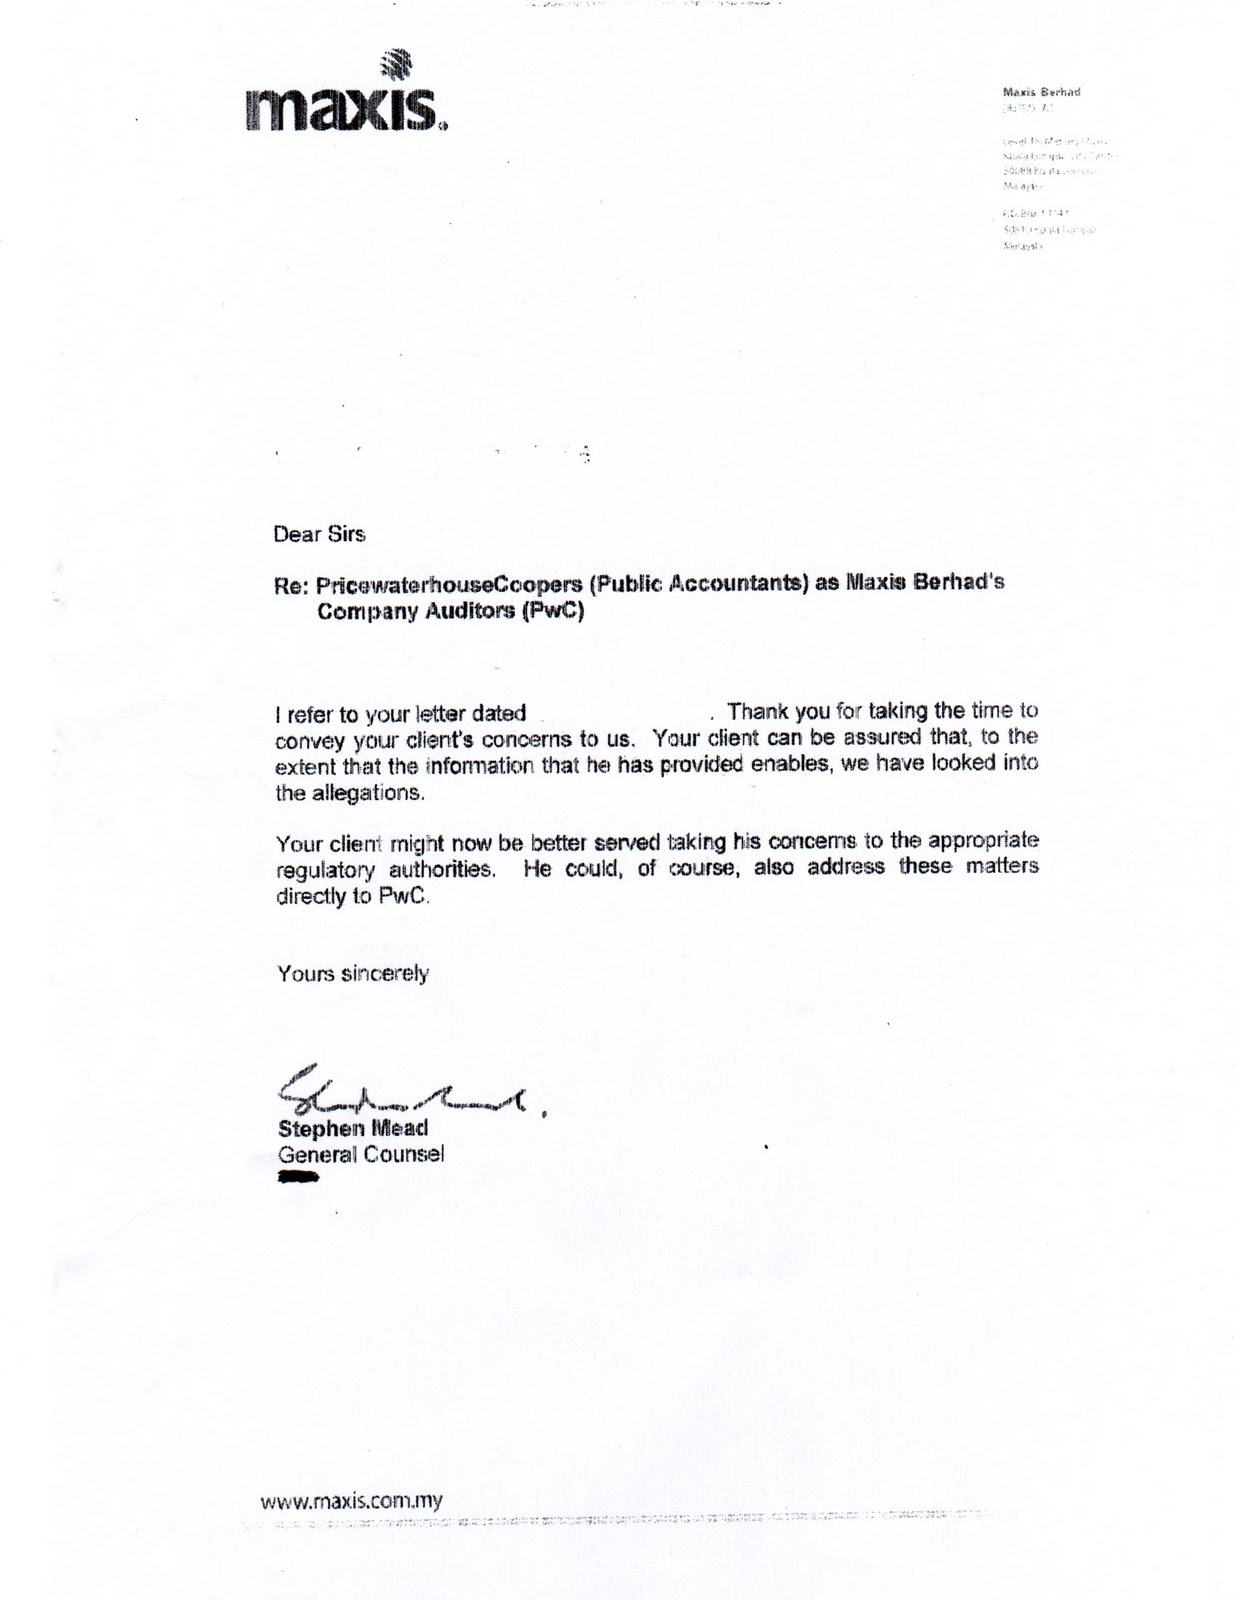 zarinahtakesapaycut PwC Malaysia trial to resume in February 2012